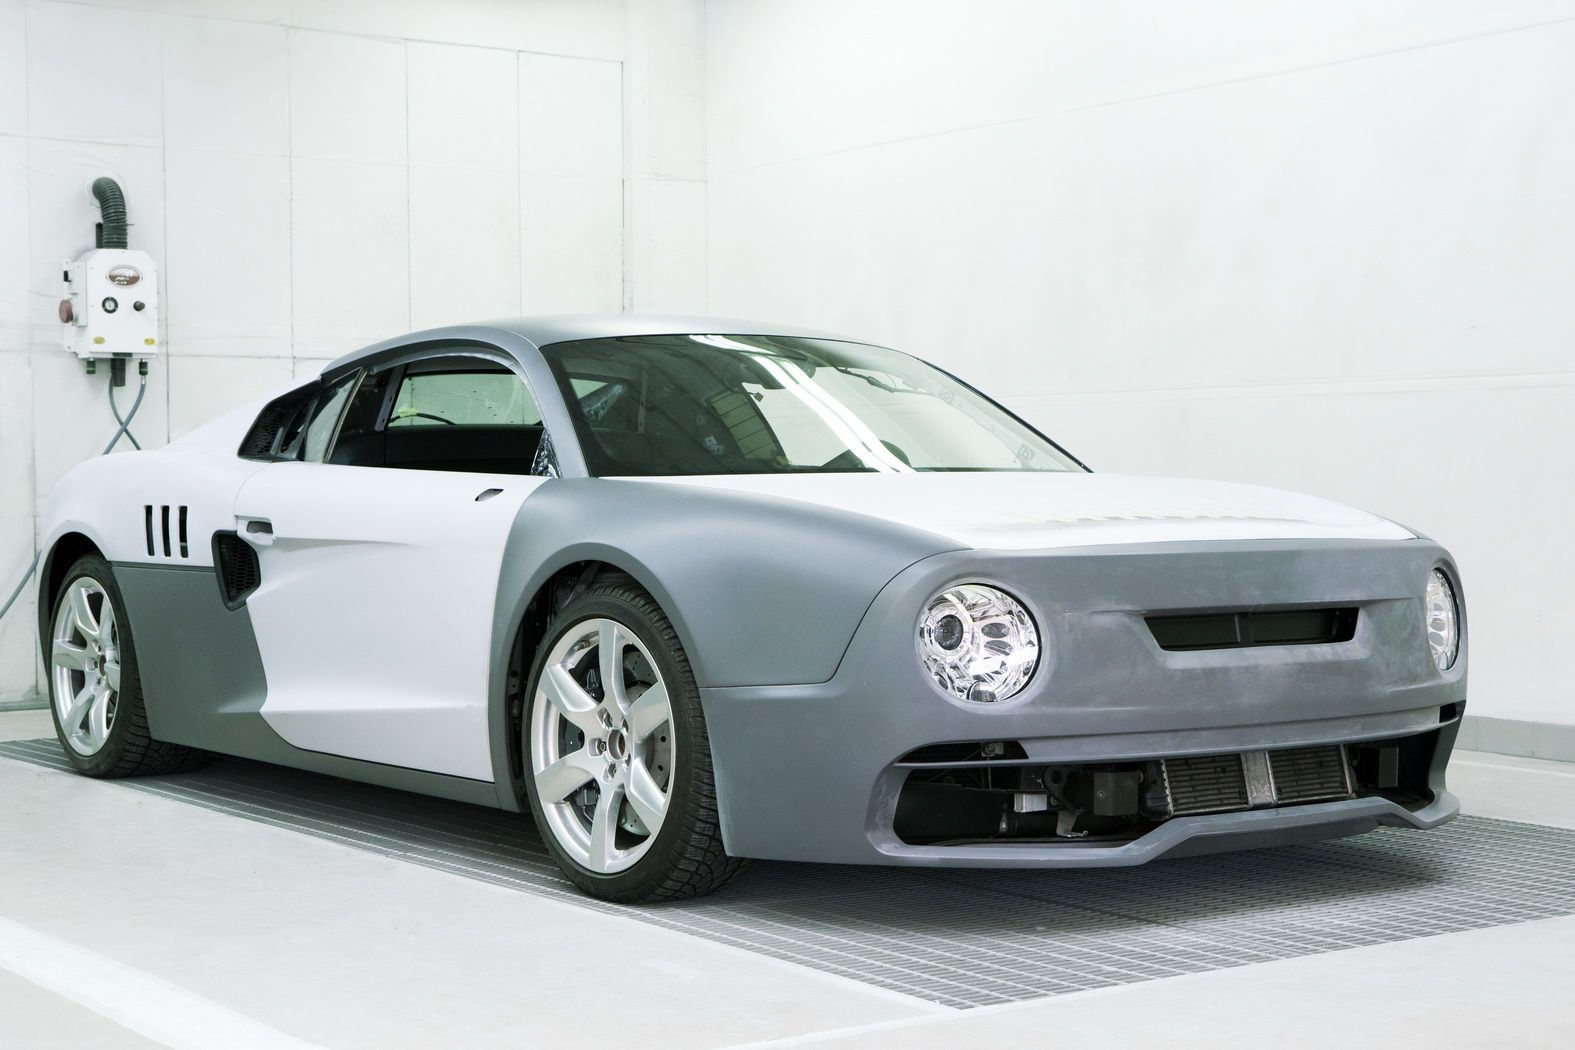 Skoda-Inspired R200 Channels Its Inner Sportscar to Put on Drift Show - autoevolution